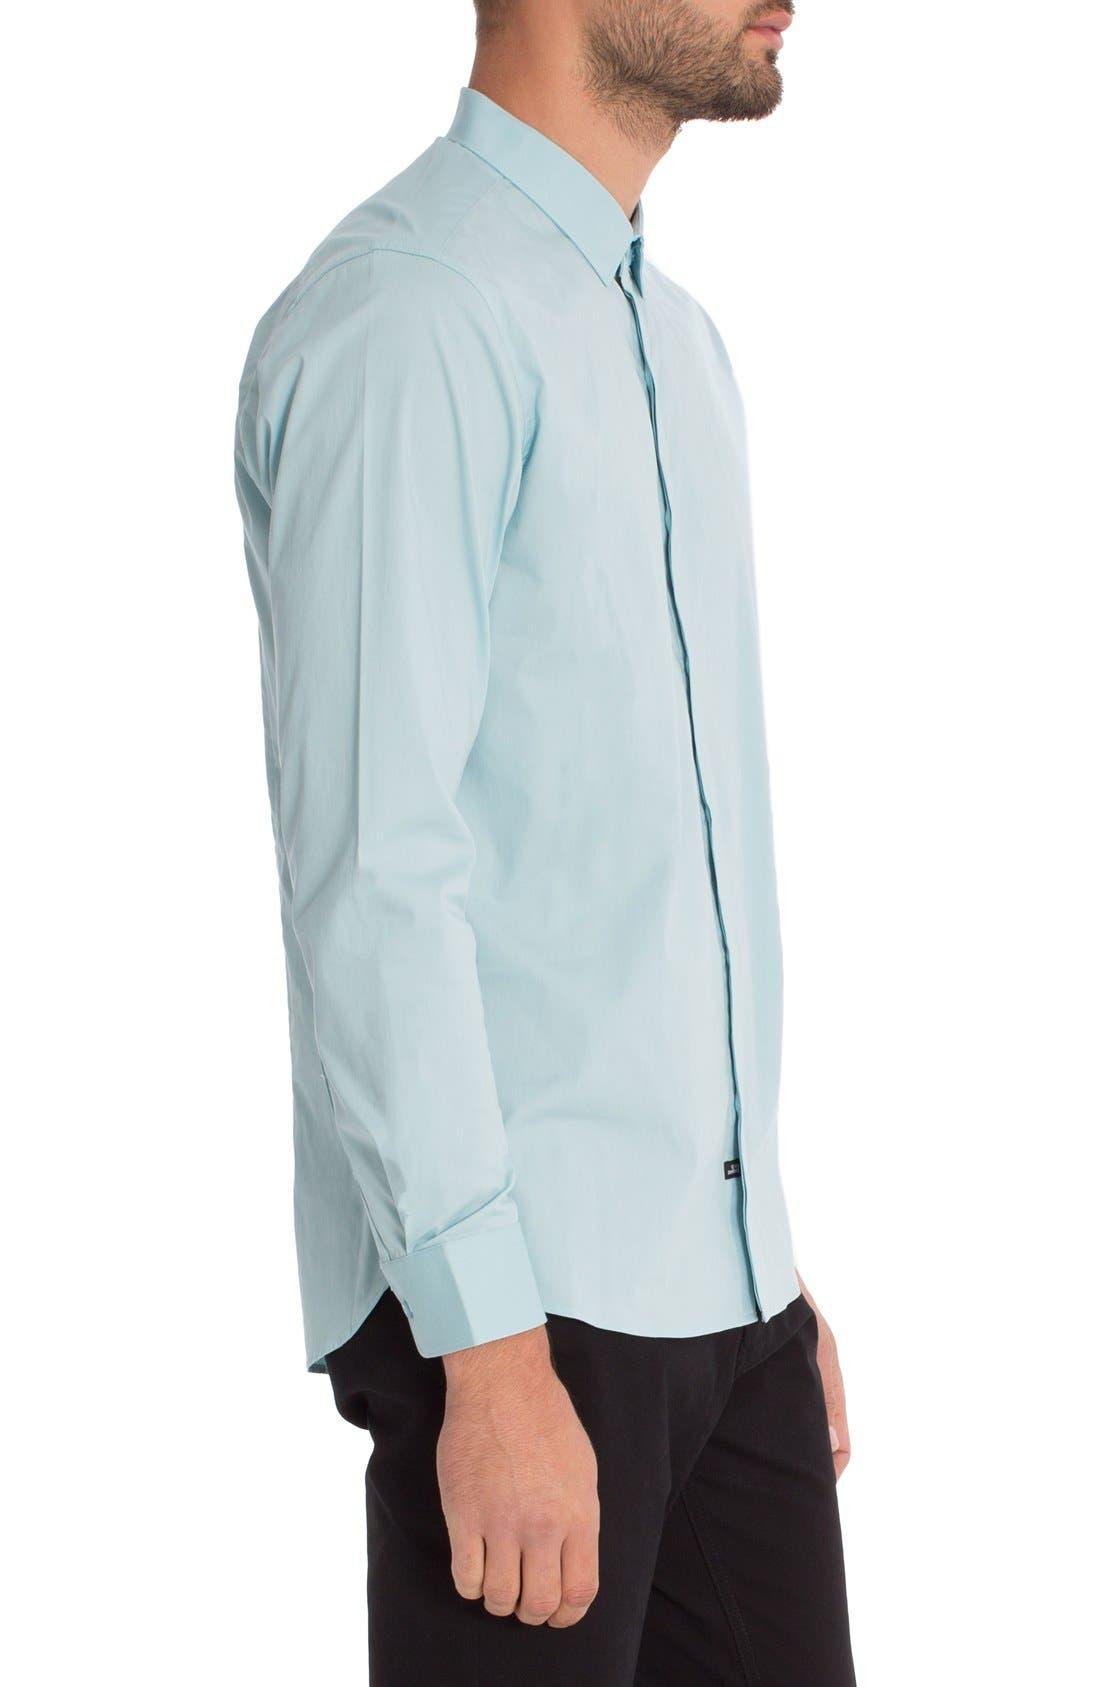 'Peace Train' Trim Fit Woven Shirt,                             Alternate thumbnail 3, color,                             Sterling Blue